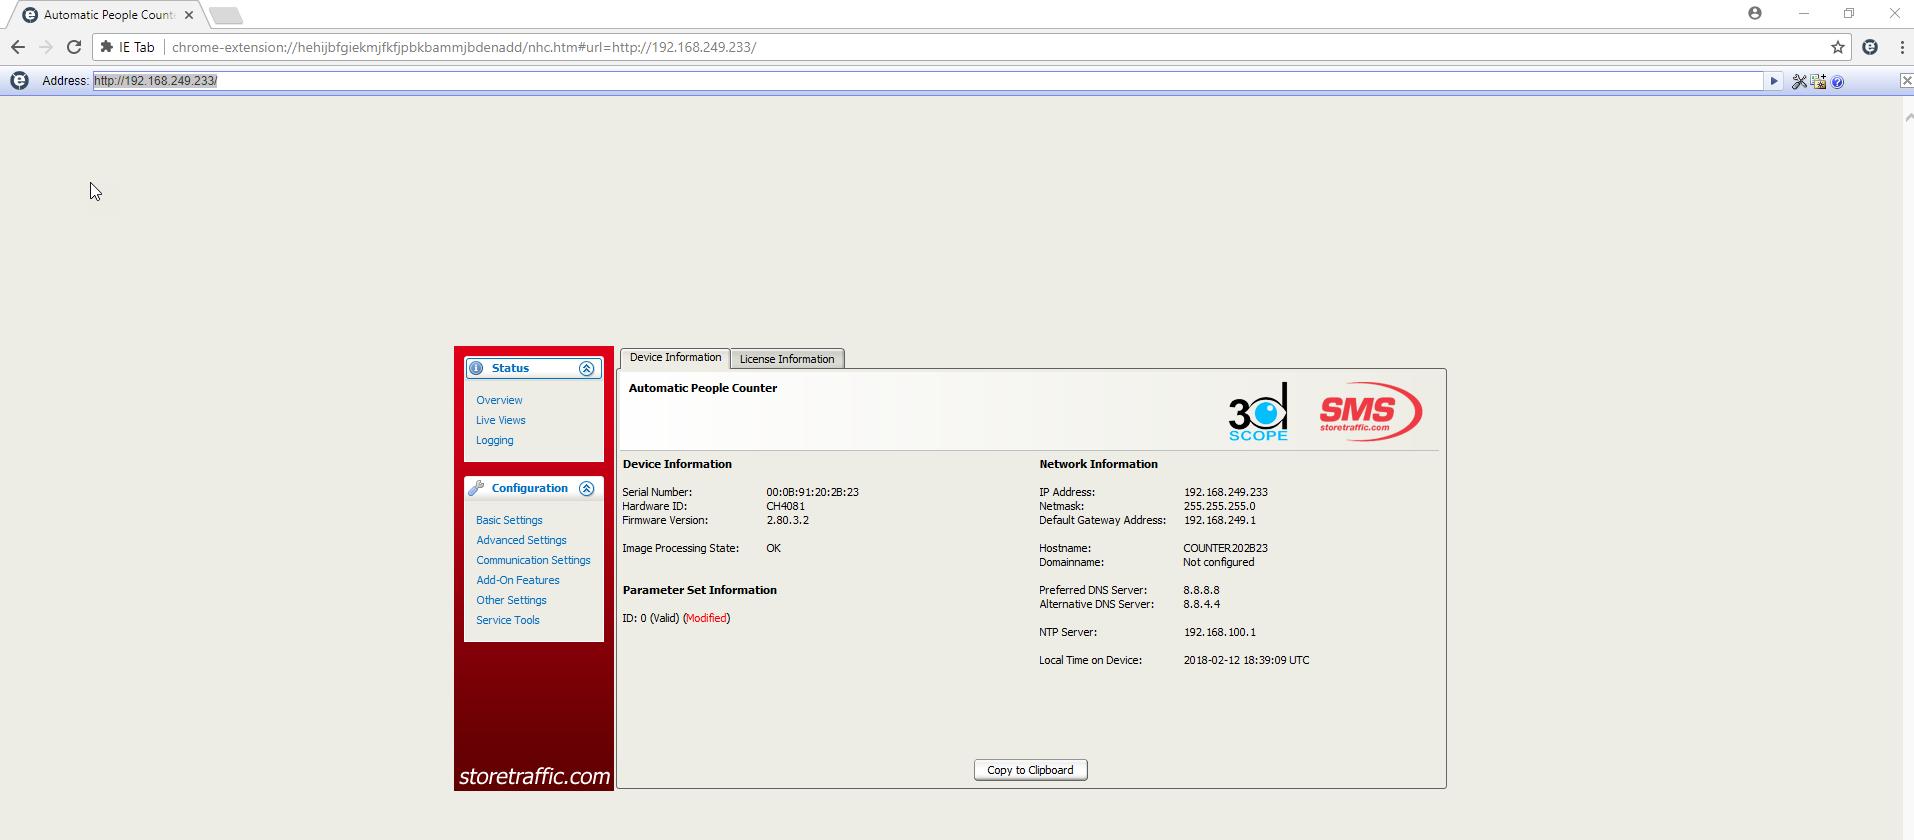 SMS Store Traffic — 3D Scope I - Adding Java/IE to Google Chrome